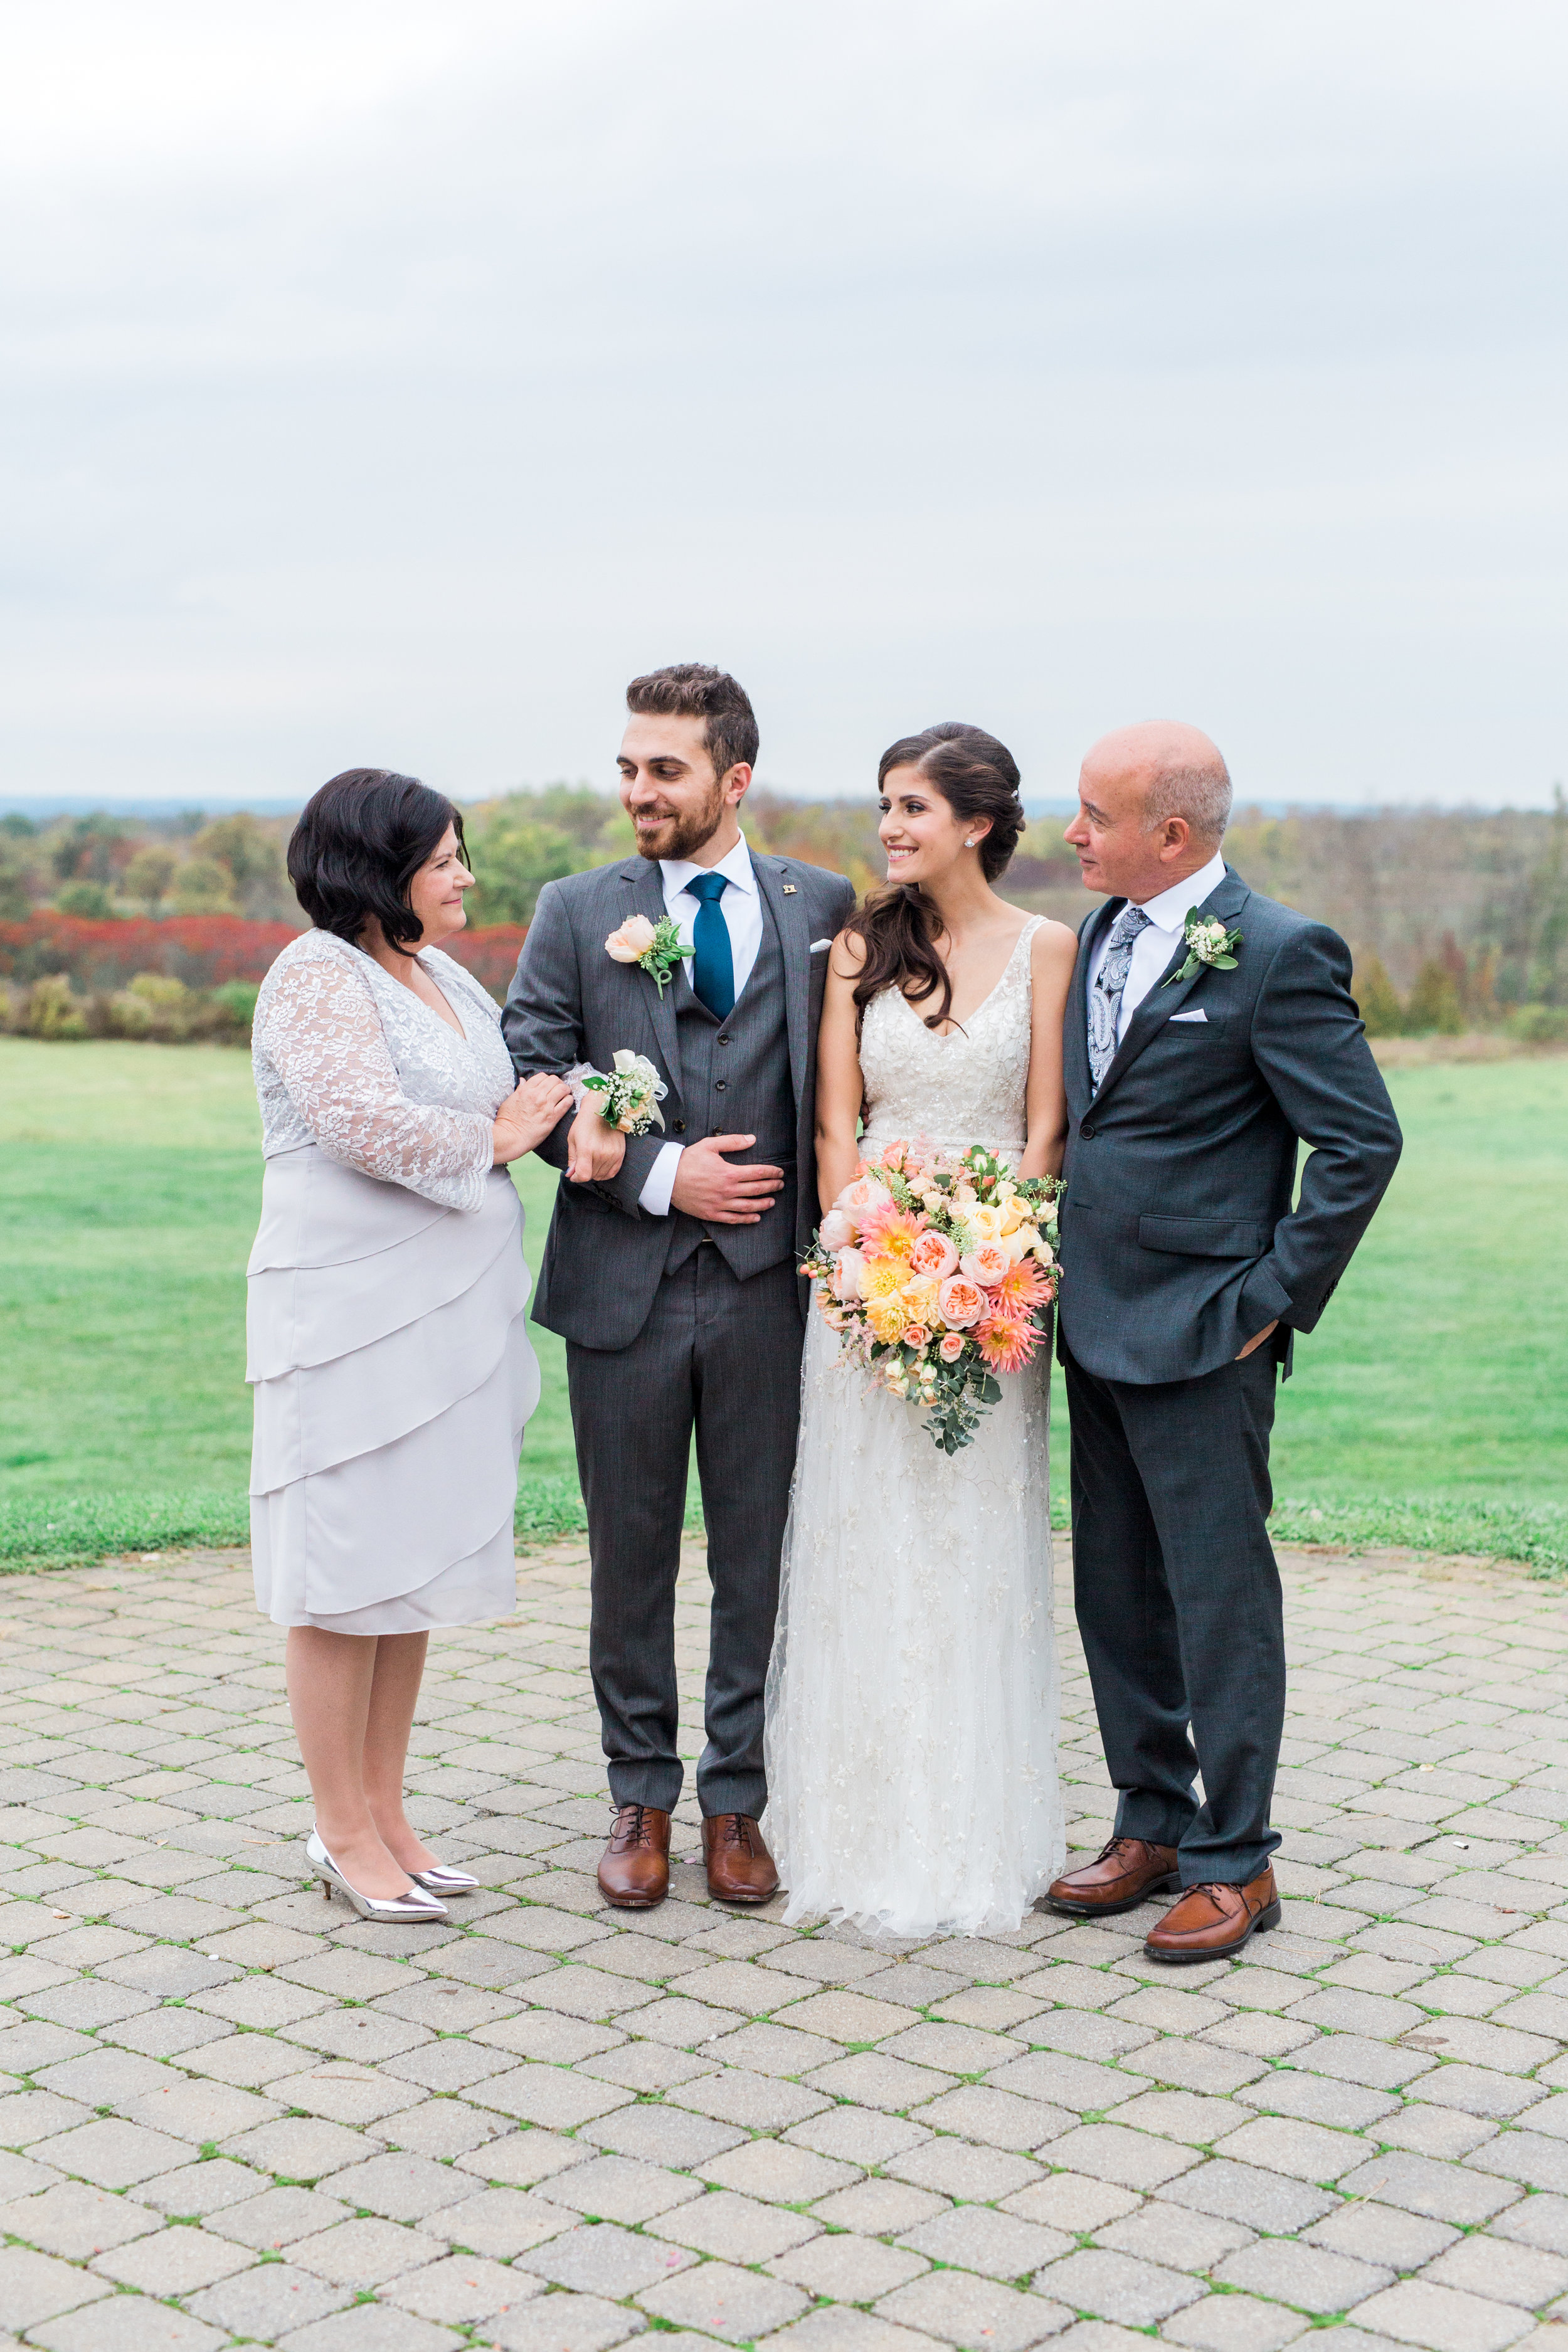 Amir-Golbazi-Danielle-Giroux-Photography_Toronto-Wedding_Cedarwood_Rachel-Paul_362.jpg